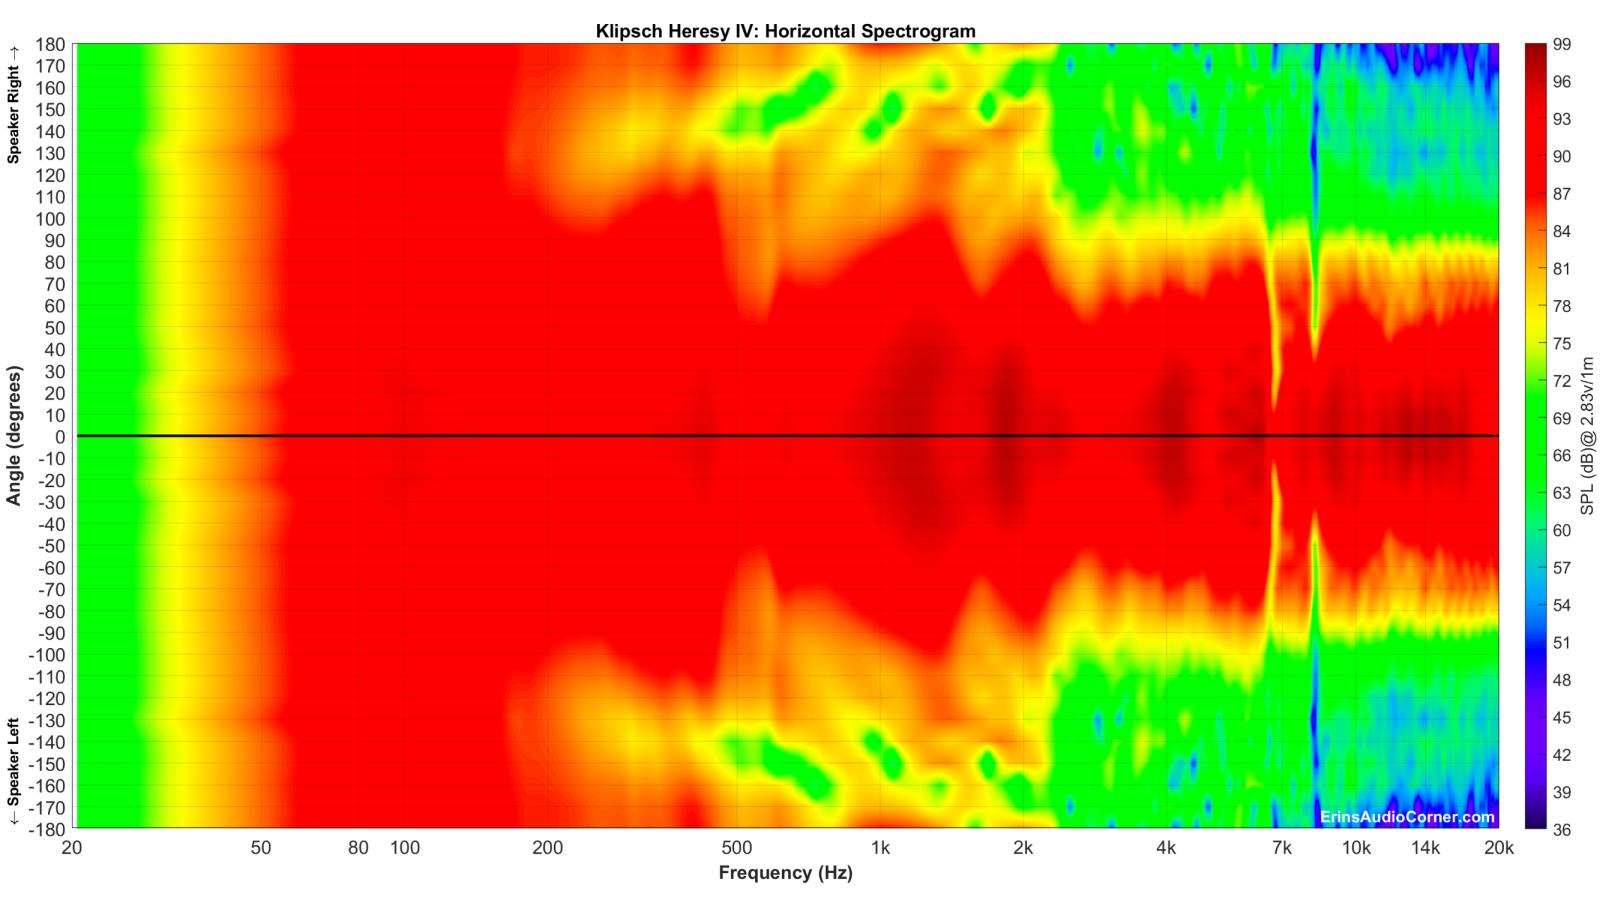 Klipsch Heresy IV_Horizontal_Spectrogram_Full_small.png